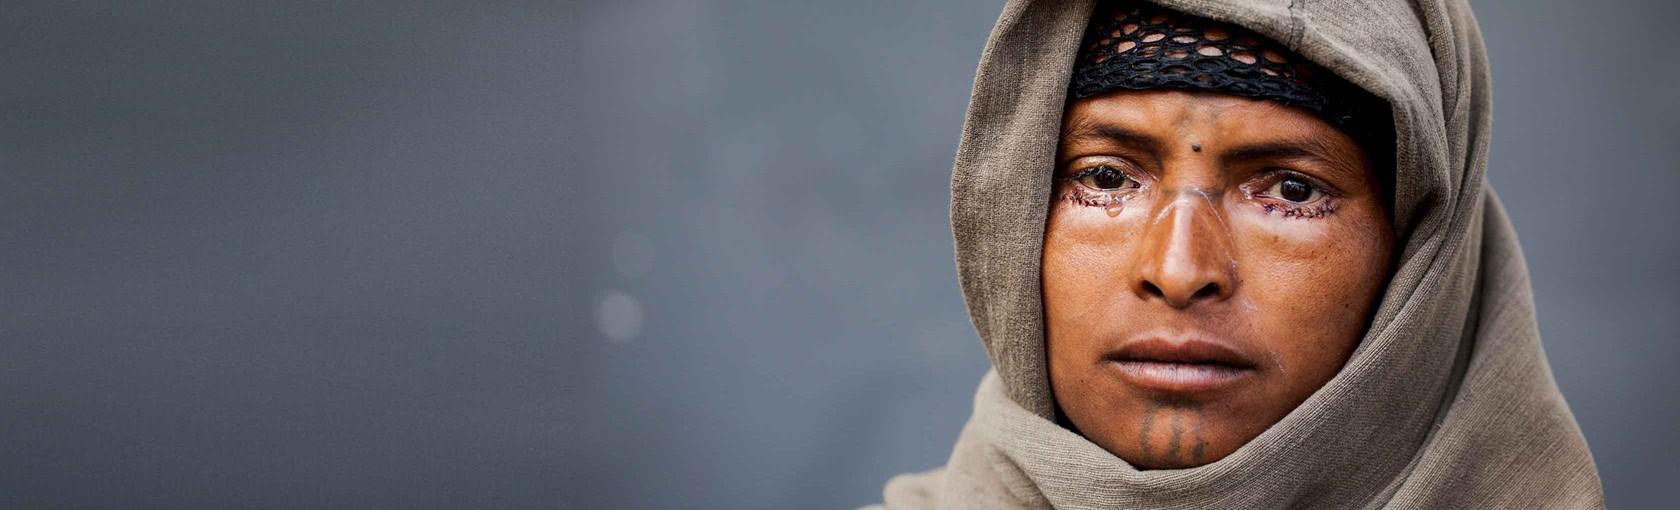 trachoma-face